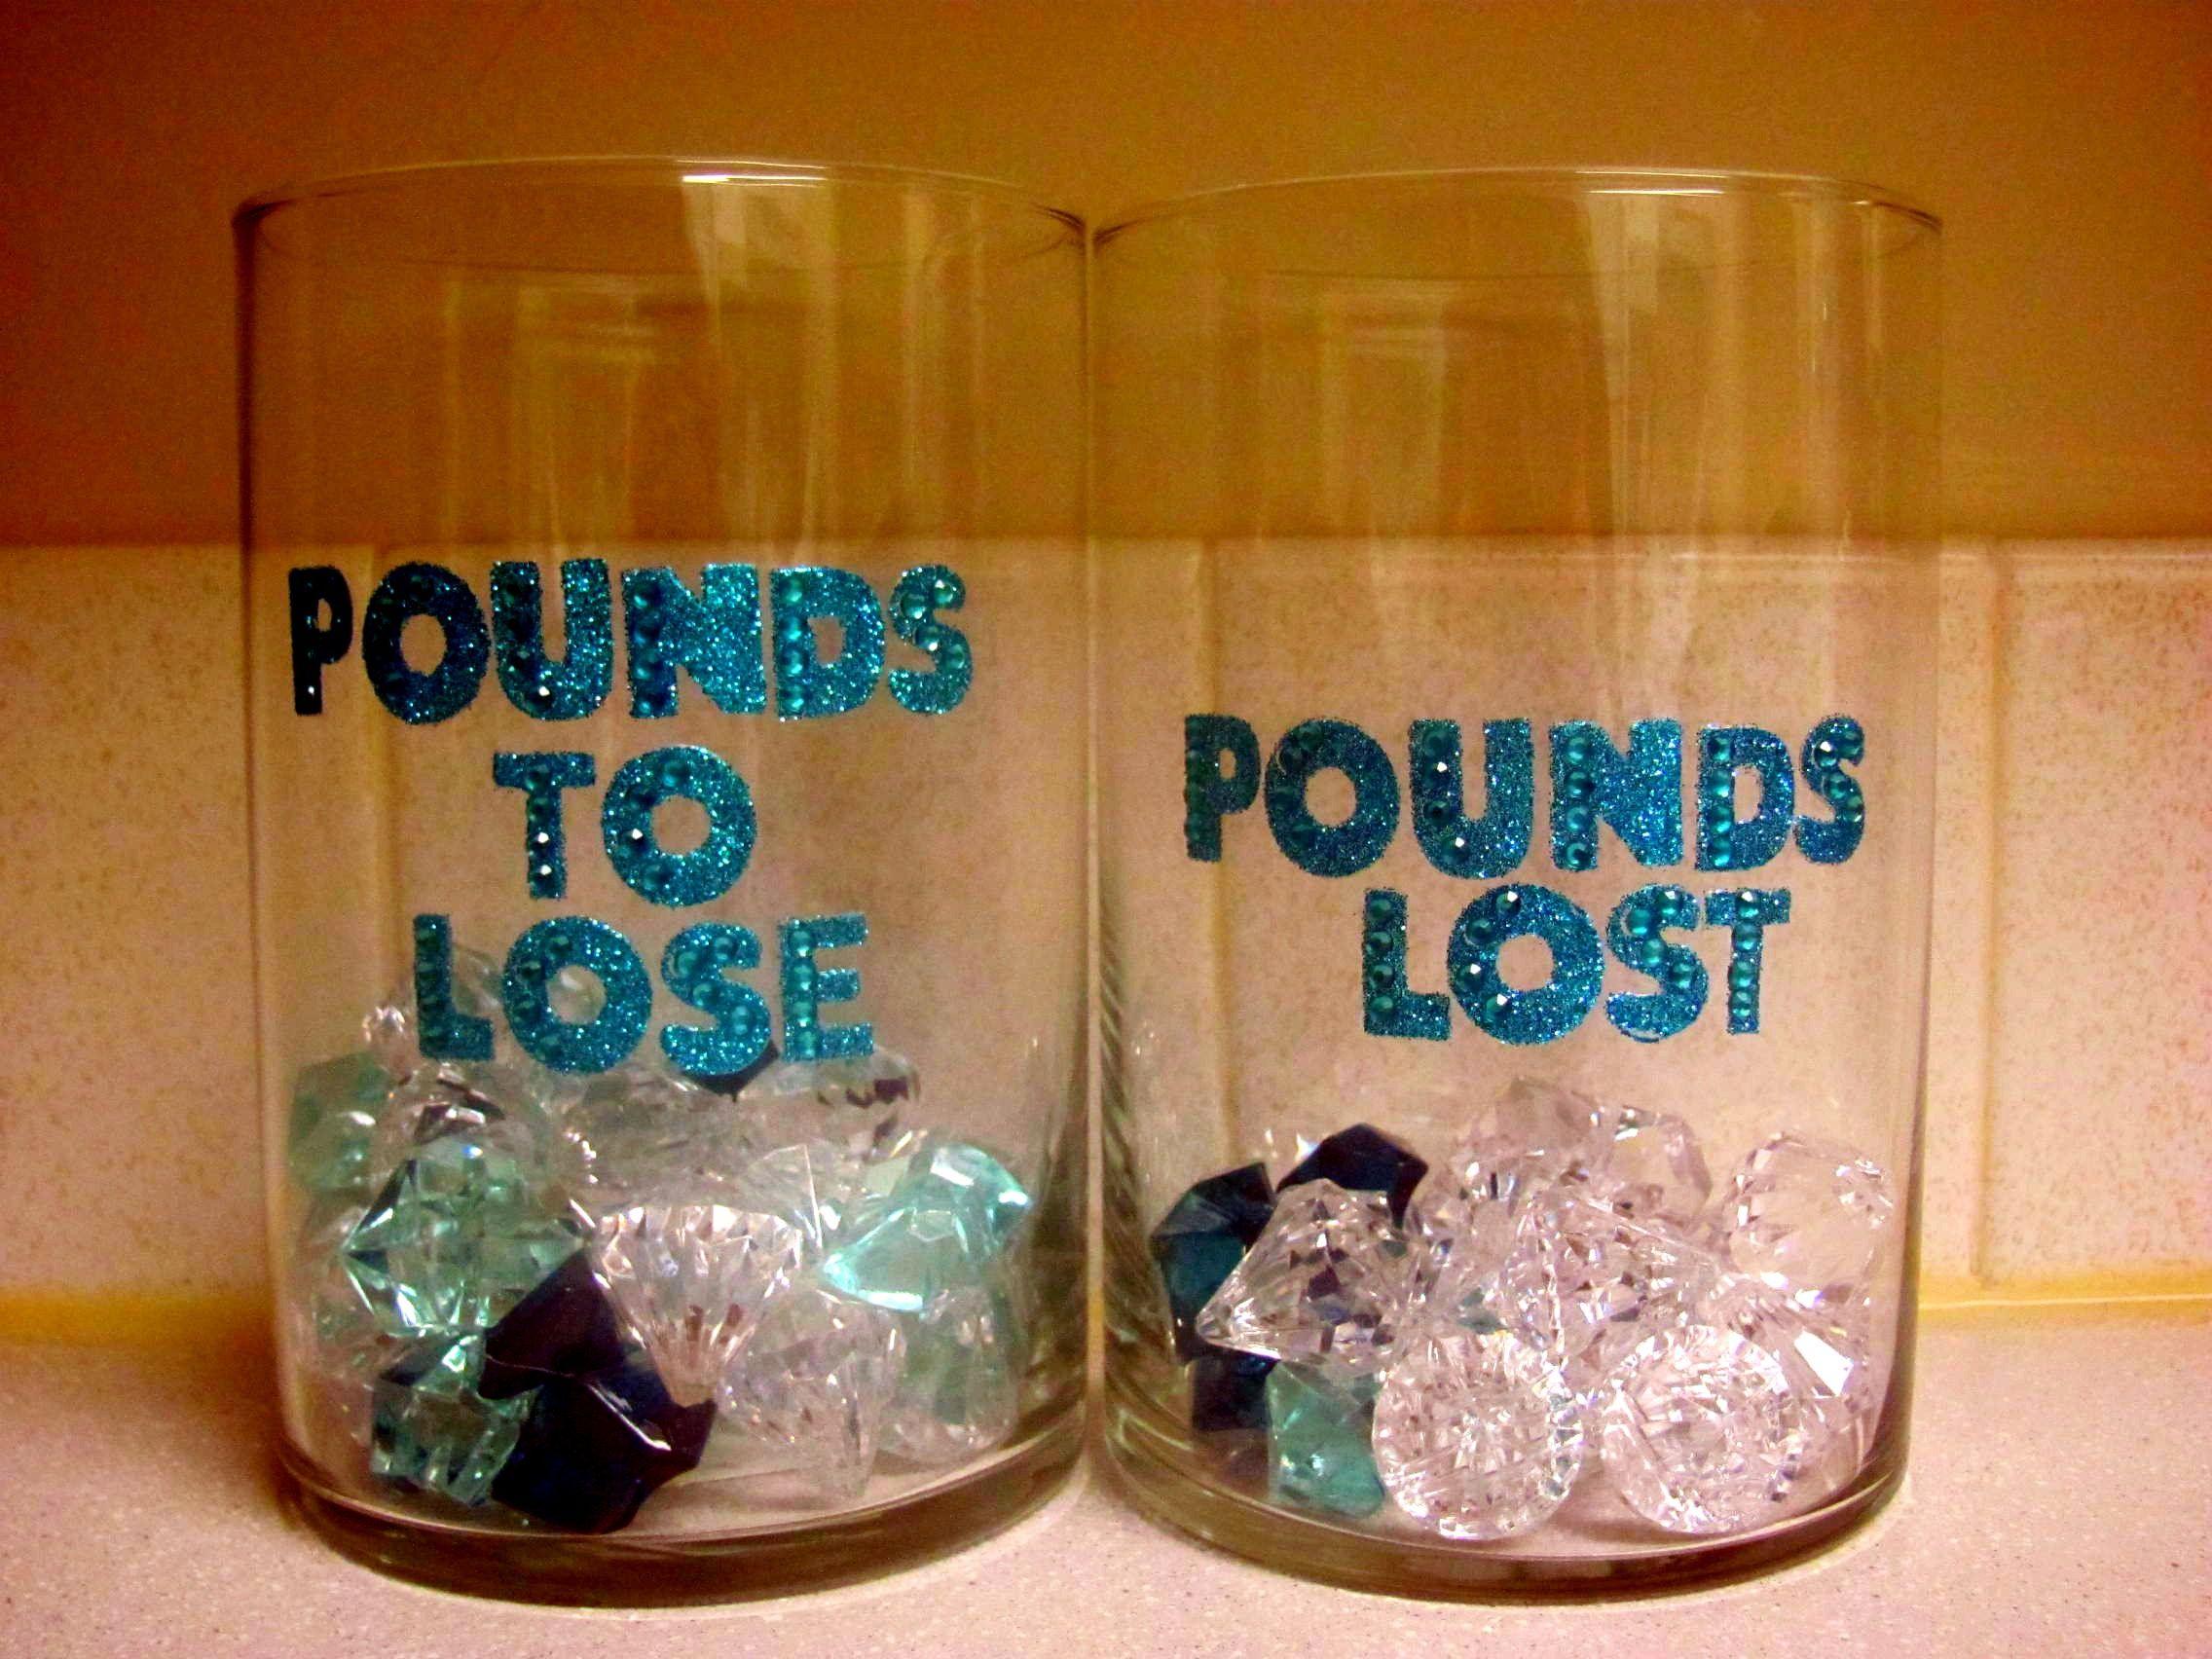 15 lbs weight loss plan